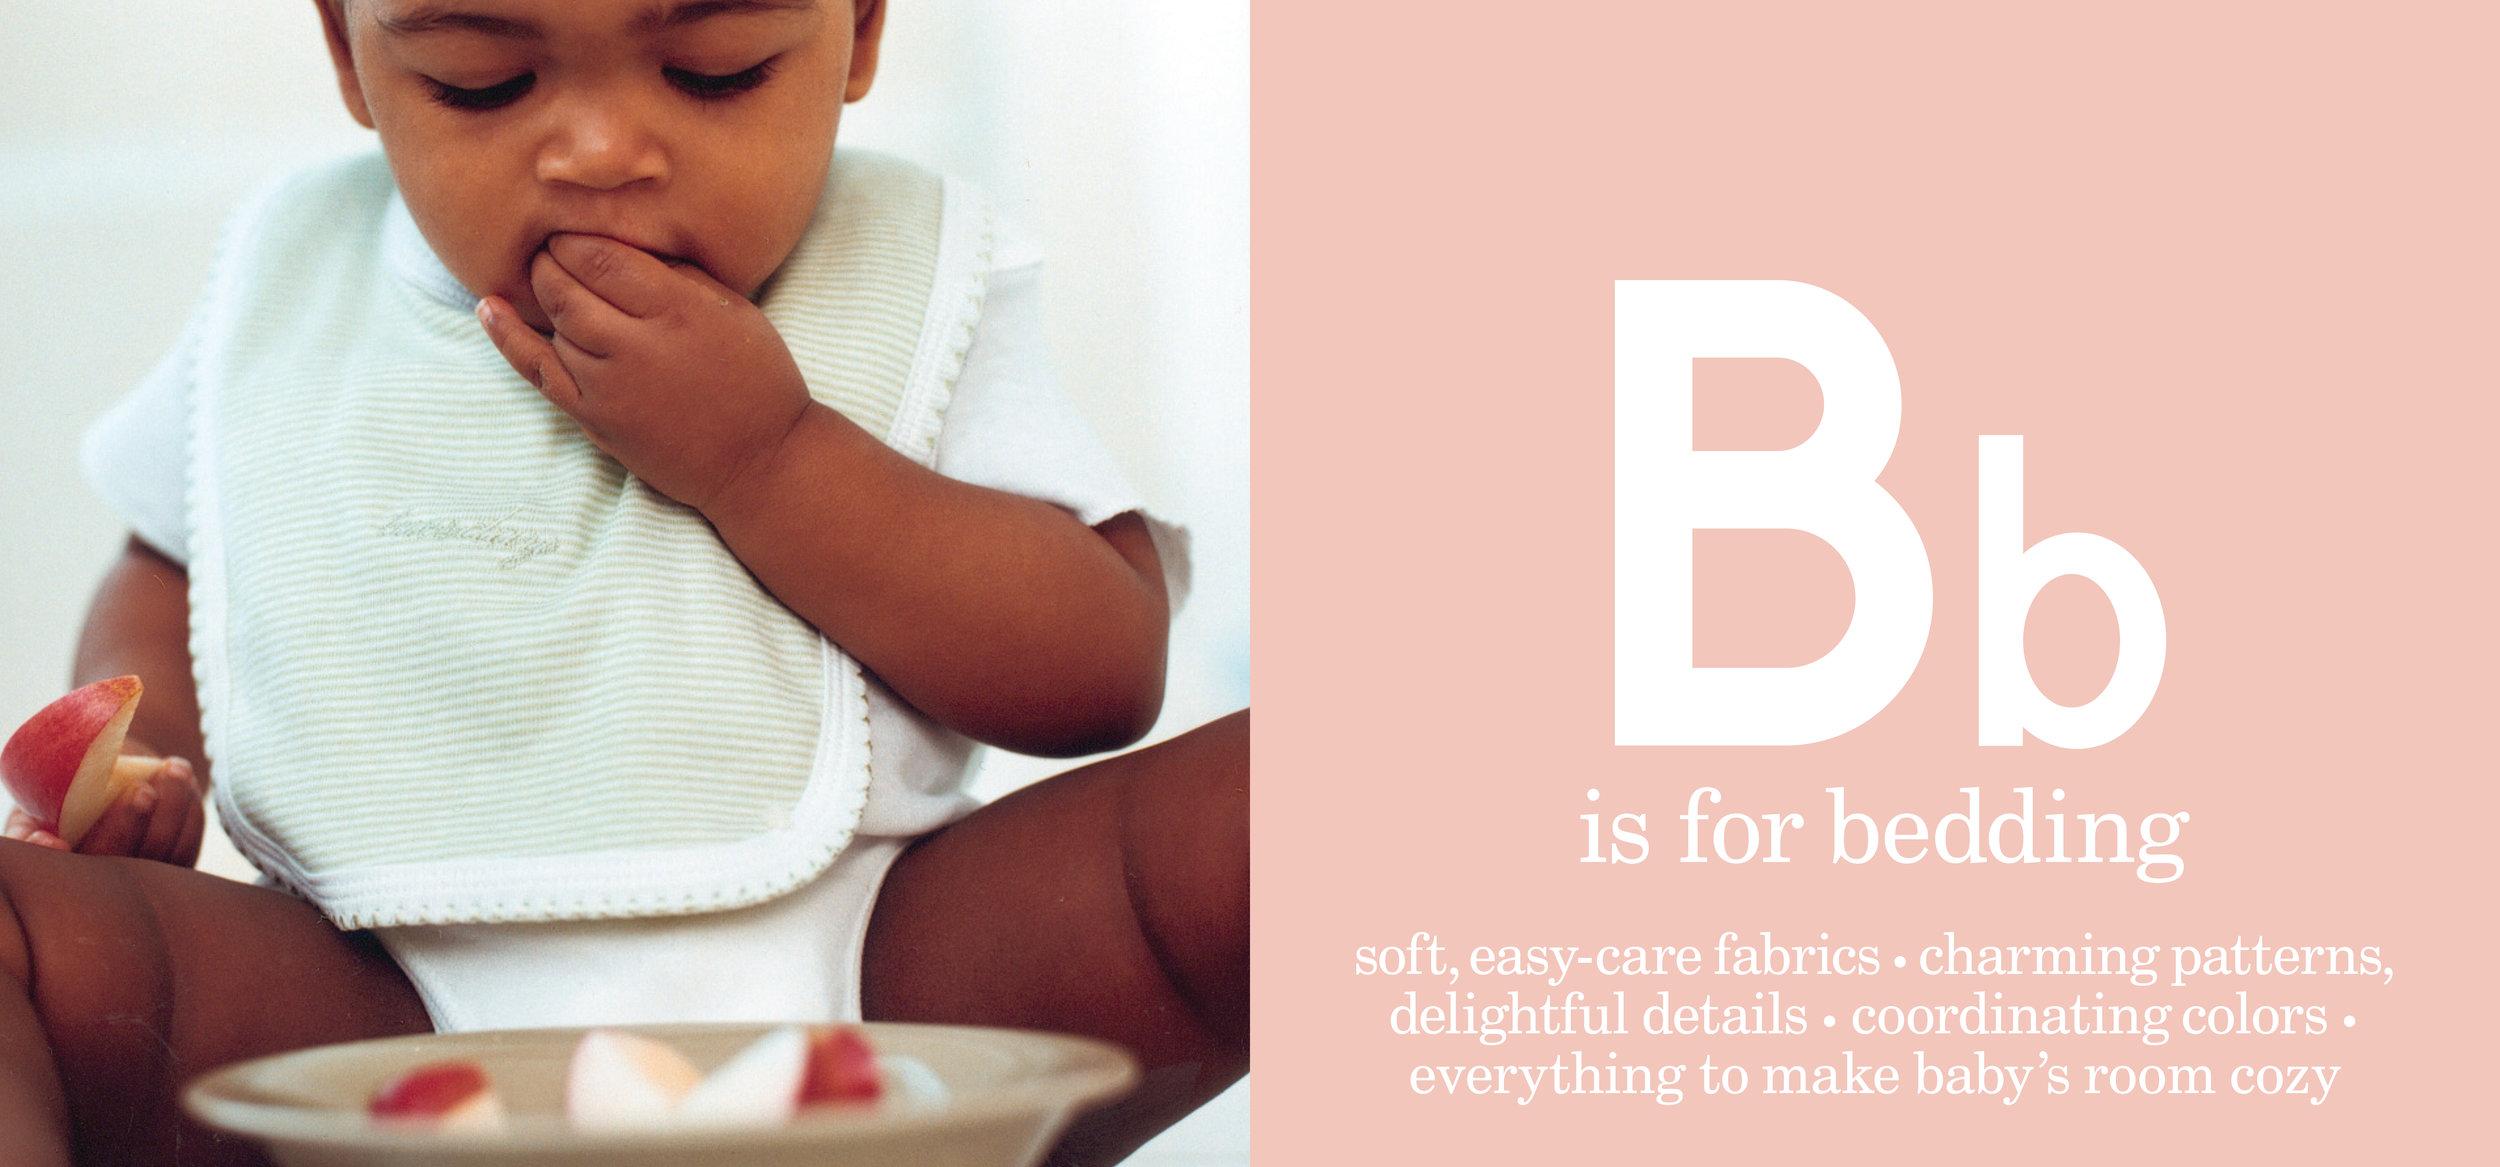 Baby2002_signage1.jpg